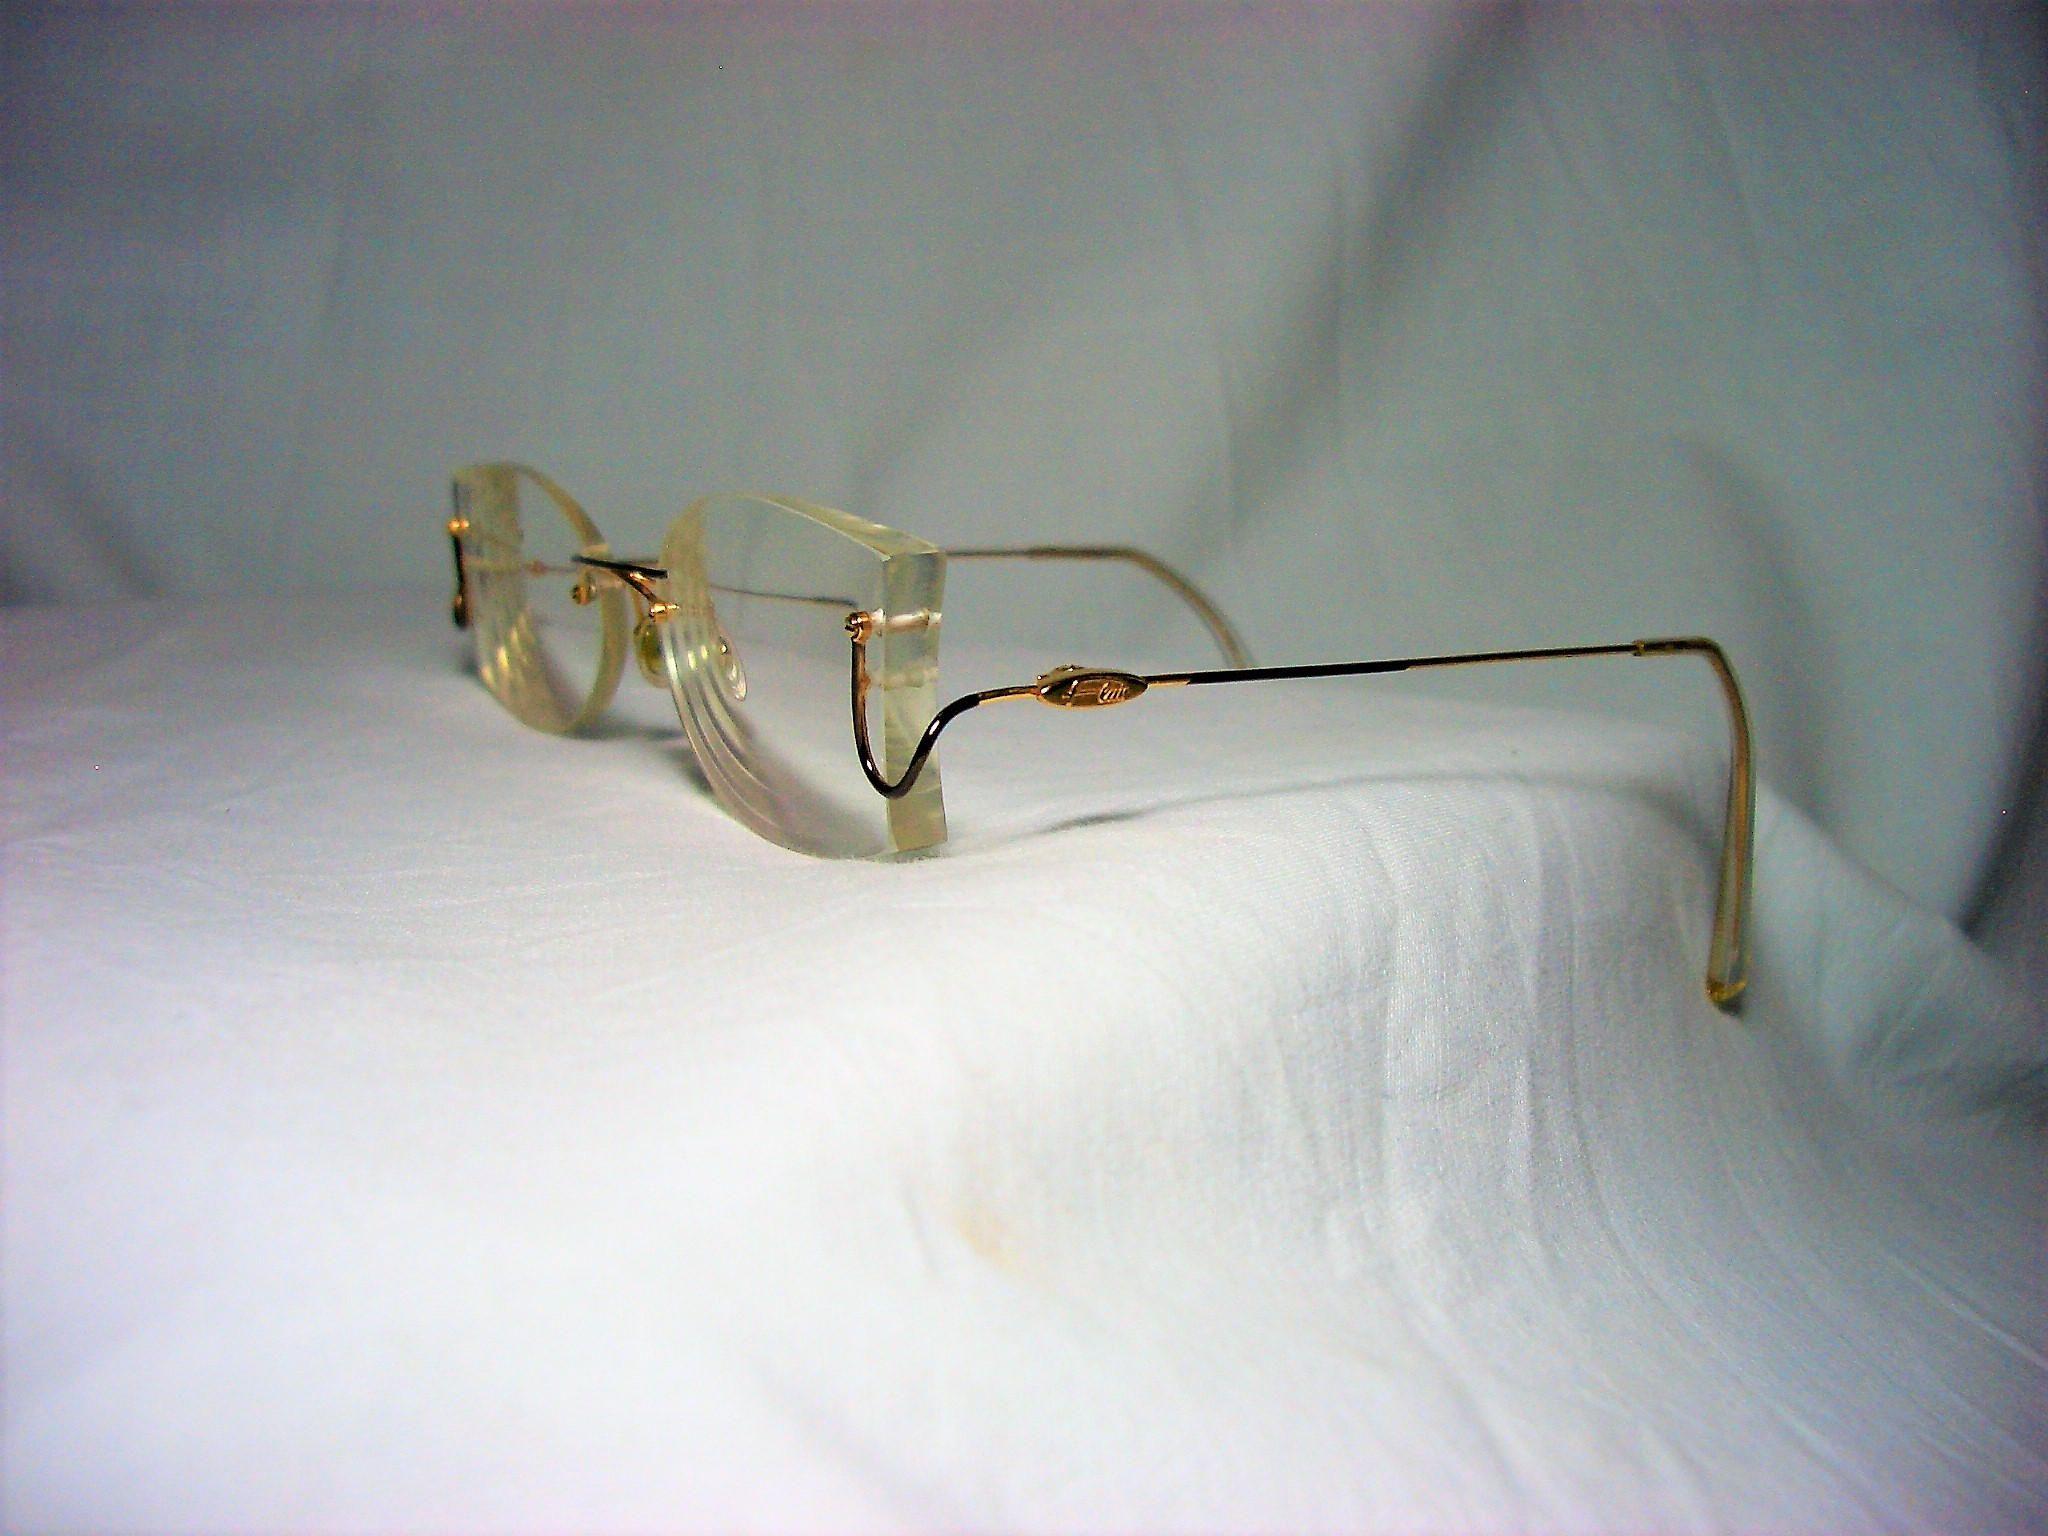 Flair Germany, 22 kt gold plated Titanium, rimless, eyeglasses ...